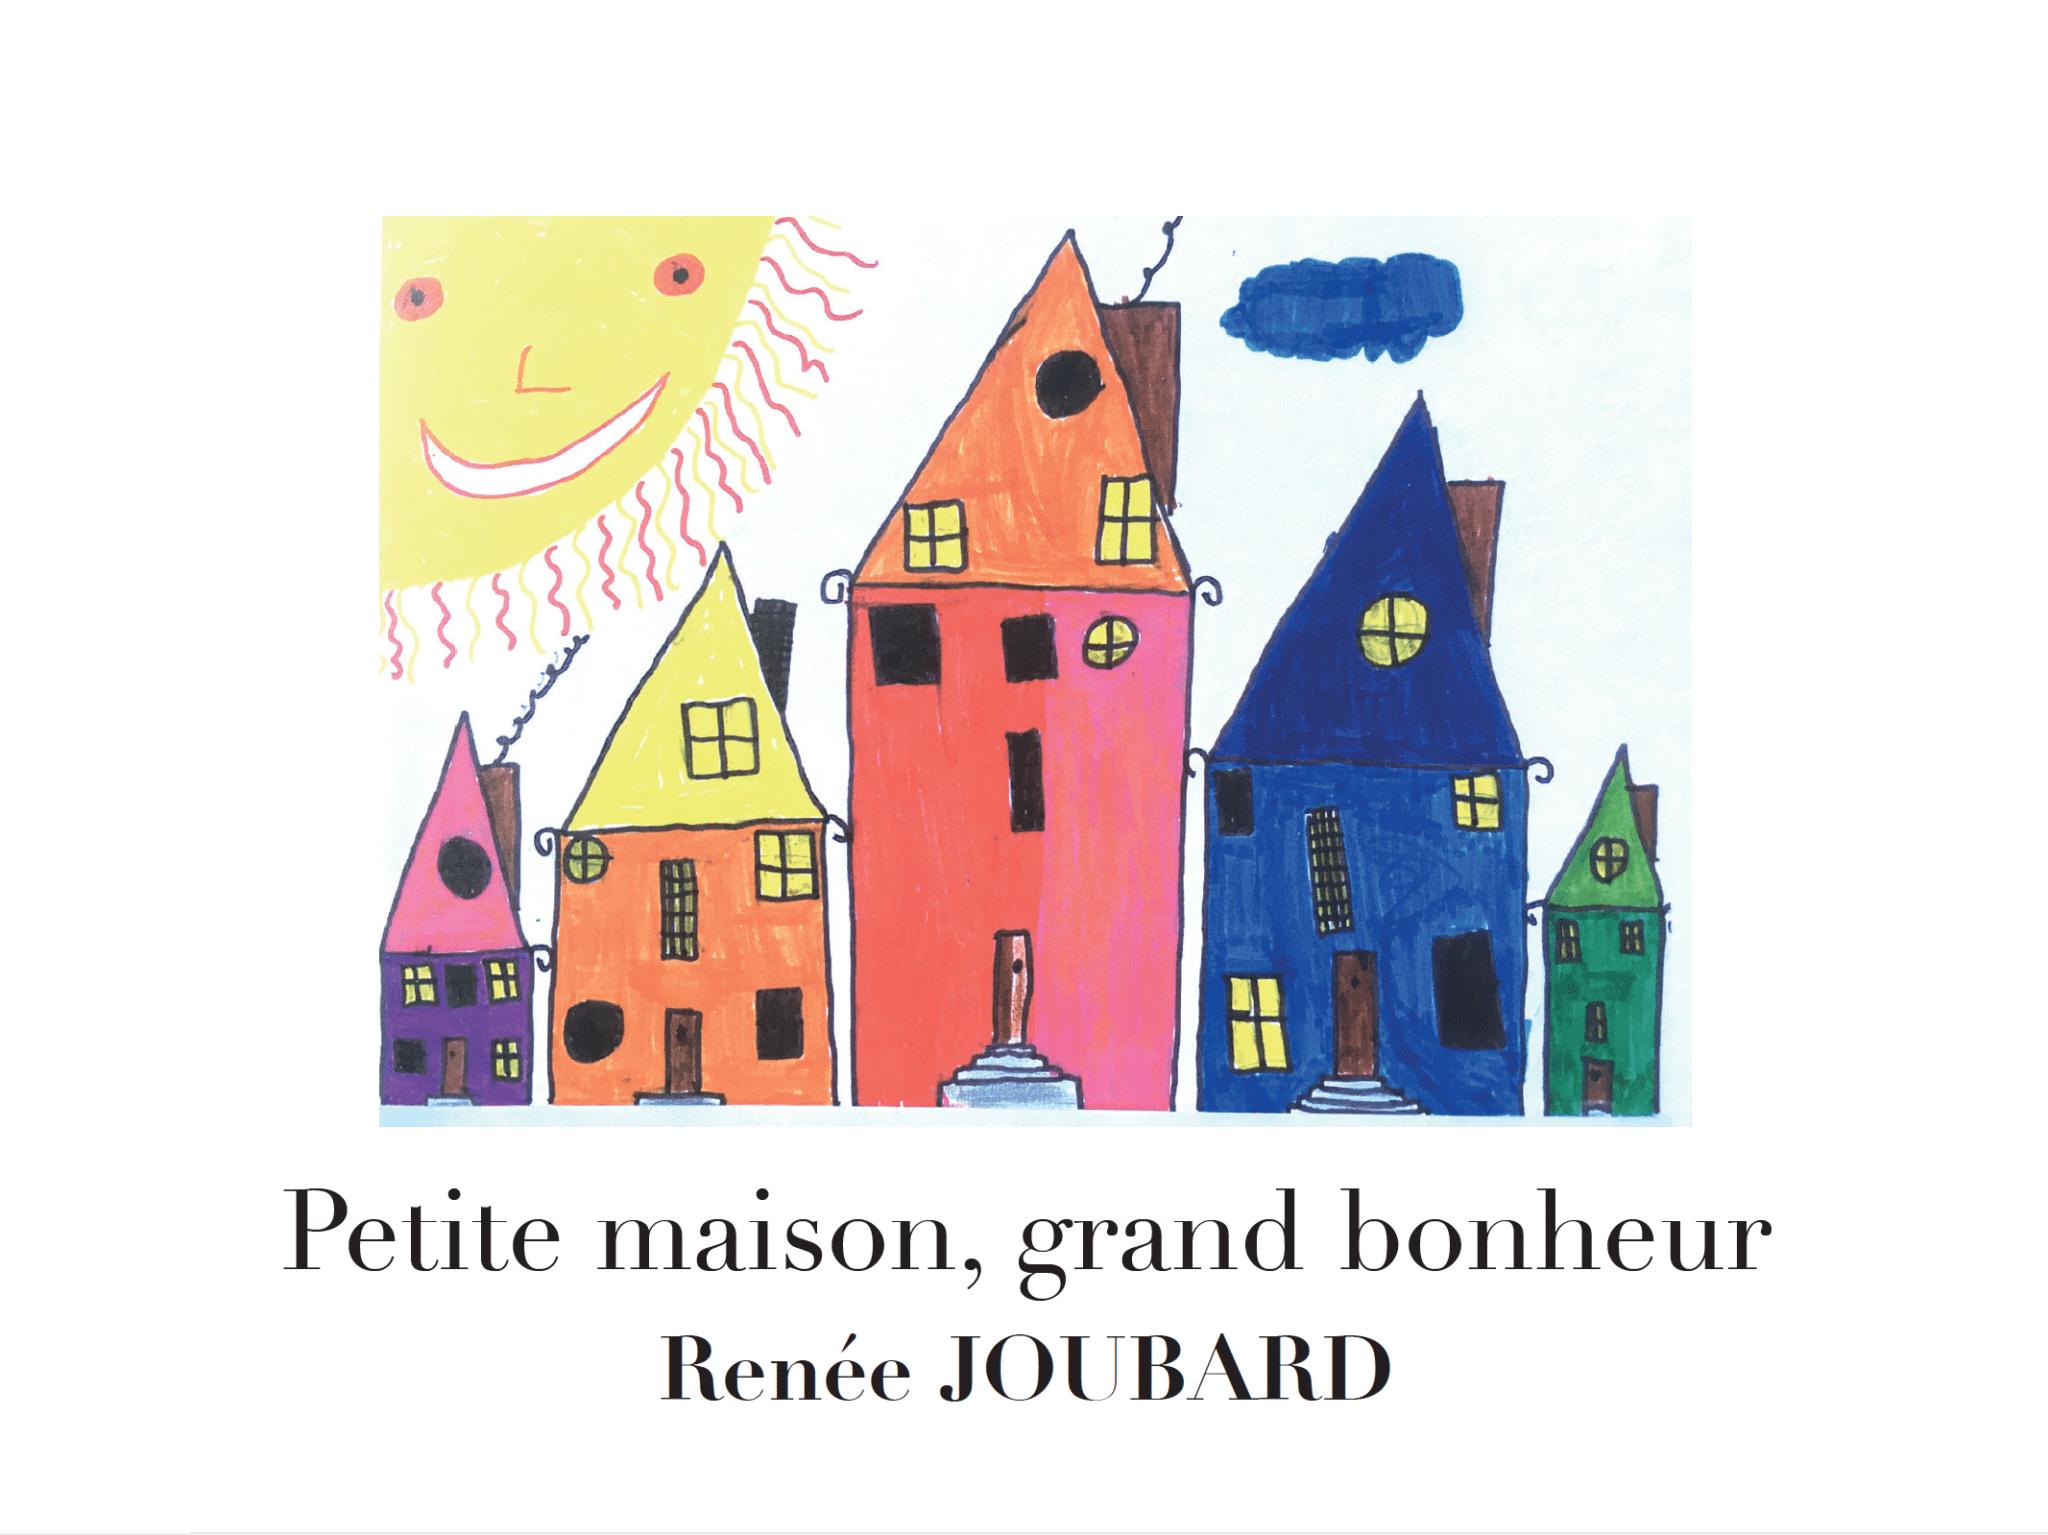 recit-de-vie-lecritoiredemarie-2020-Petite-maison-grand-bonheur-renee-joubard-1